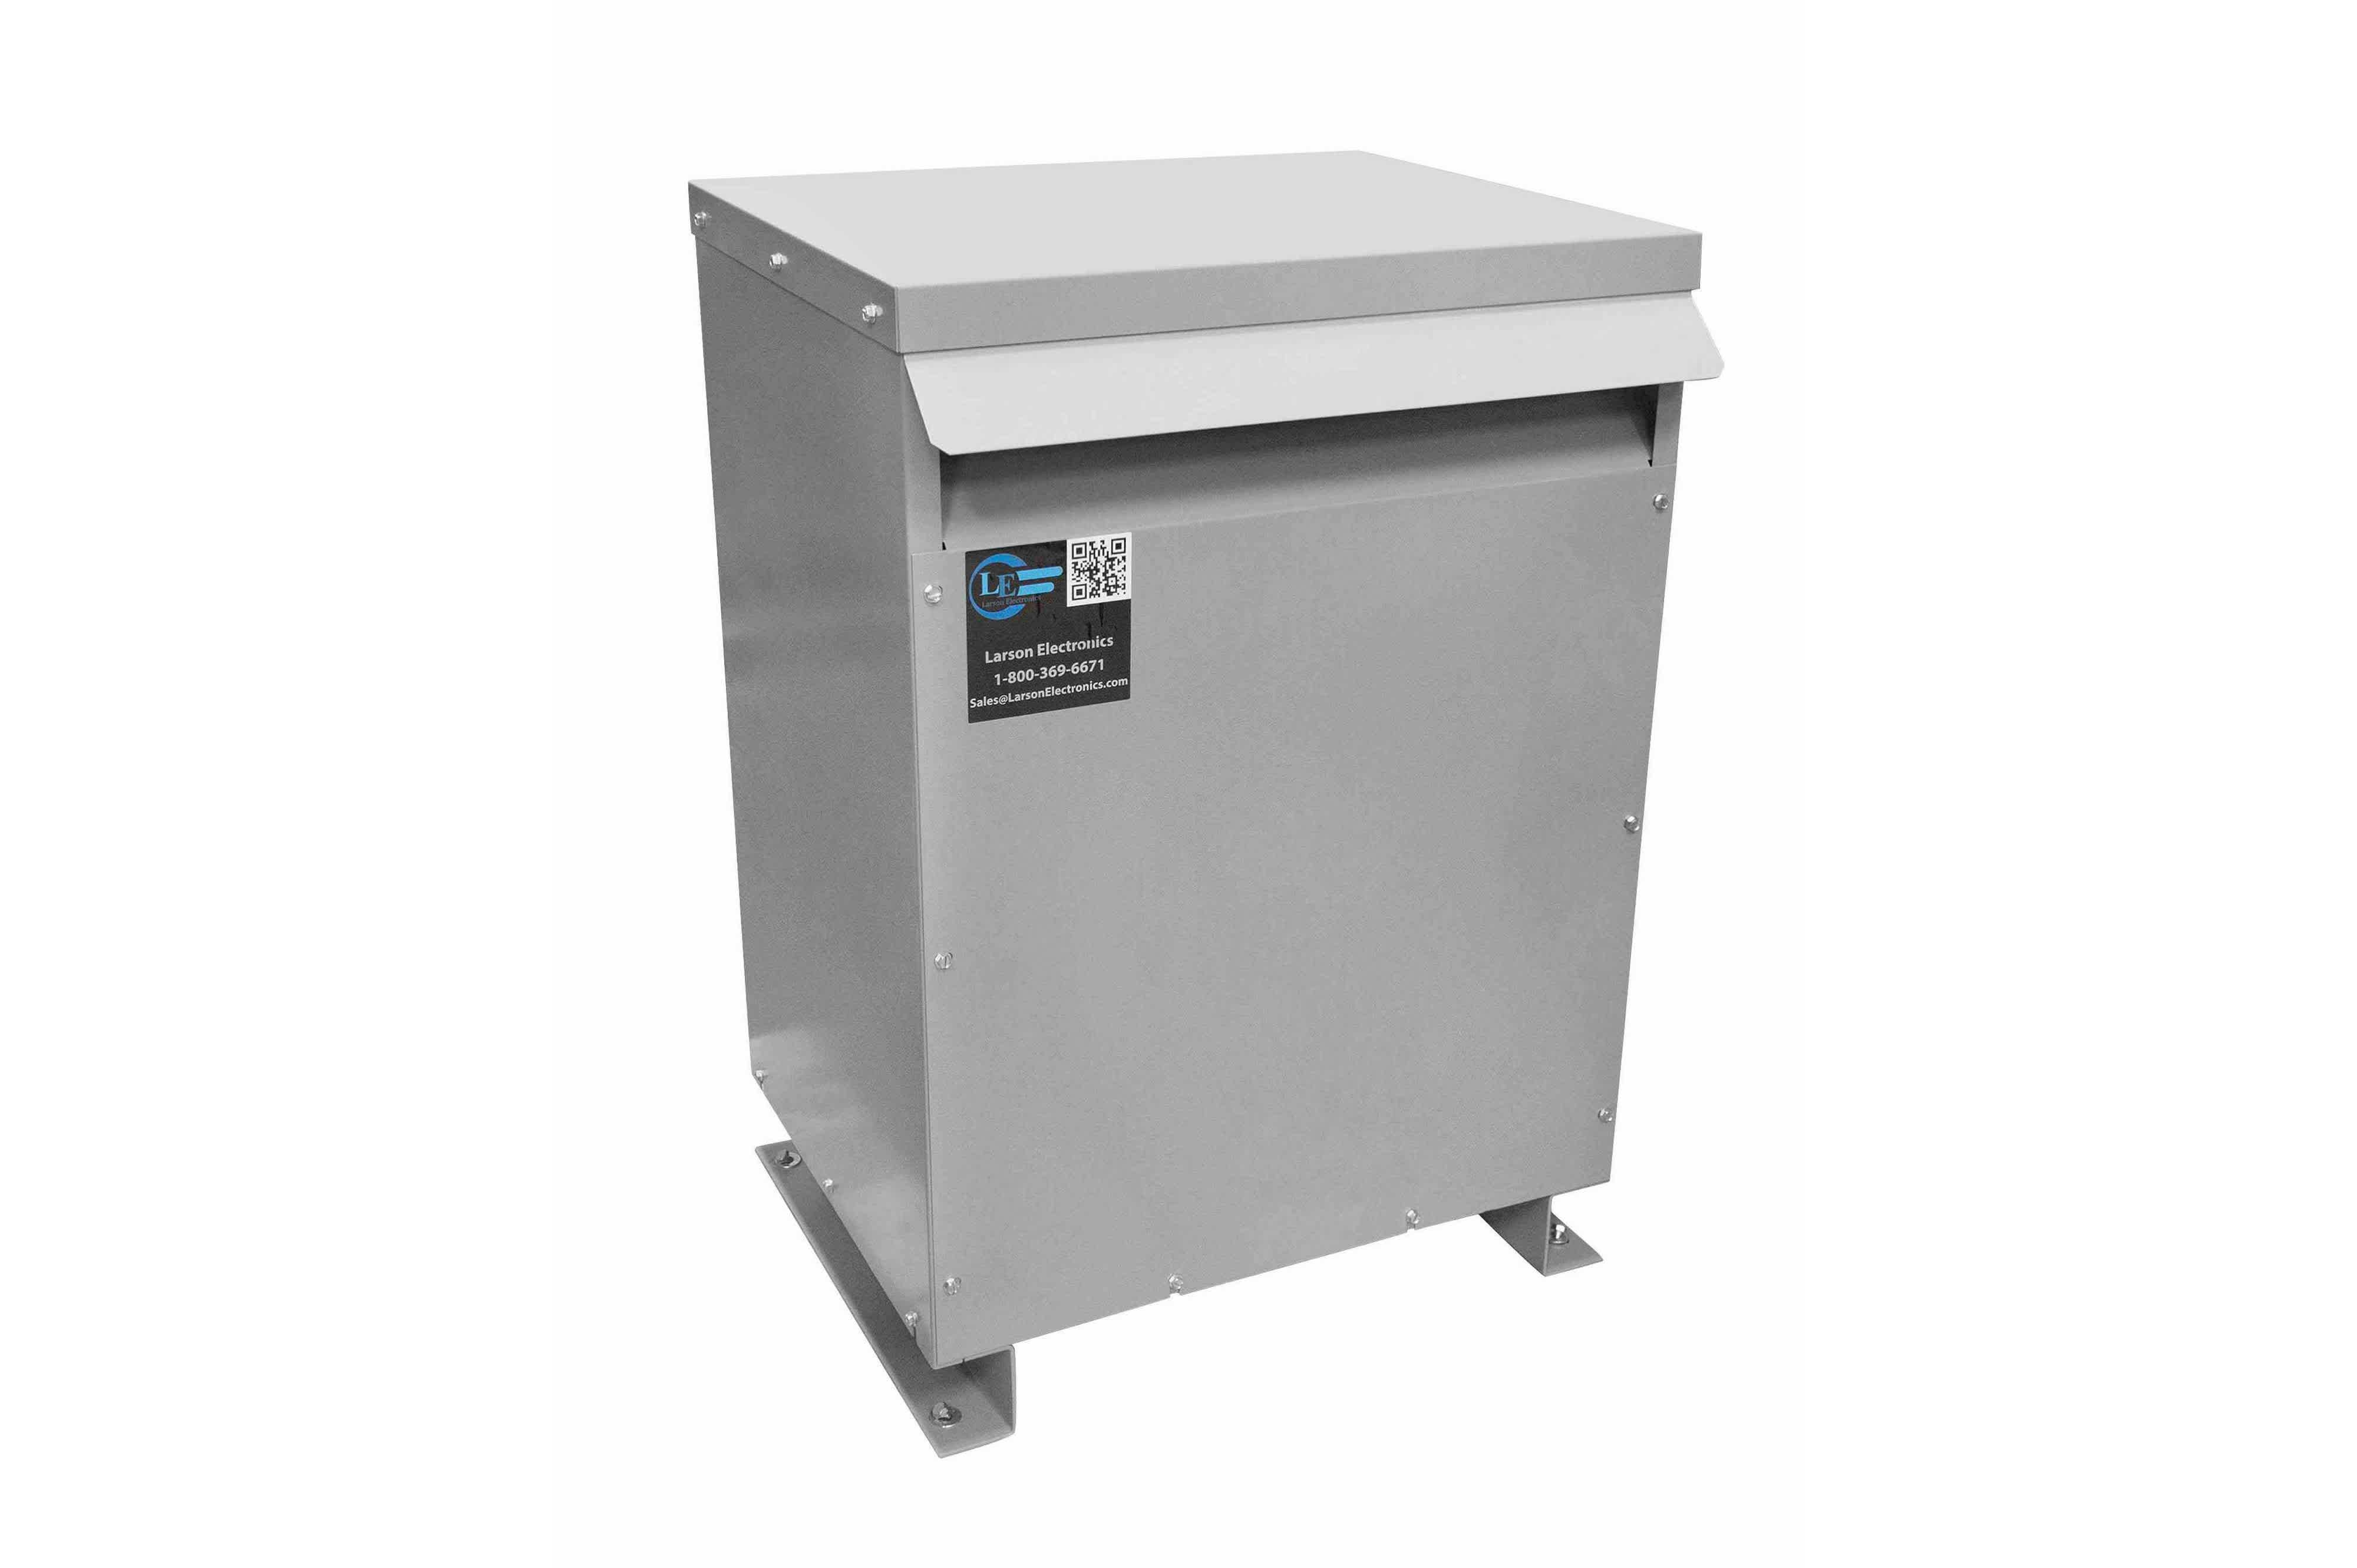 70 kVA 3PH Isolation Transformer, 208V Wye Primary, 480V Delta Secondary, N3R, Ventilated, 60 Hz